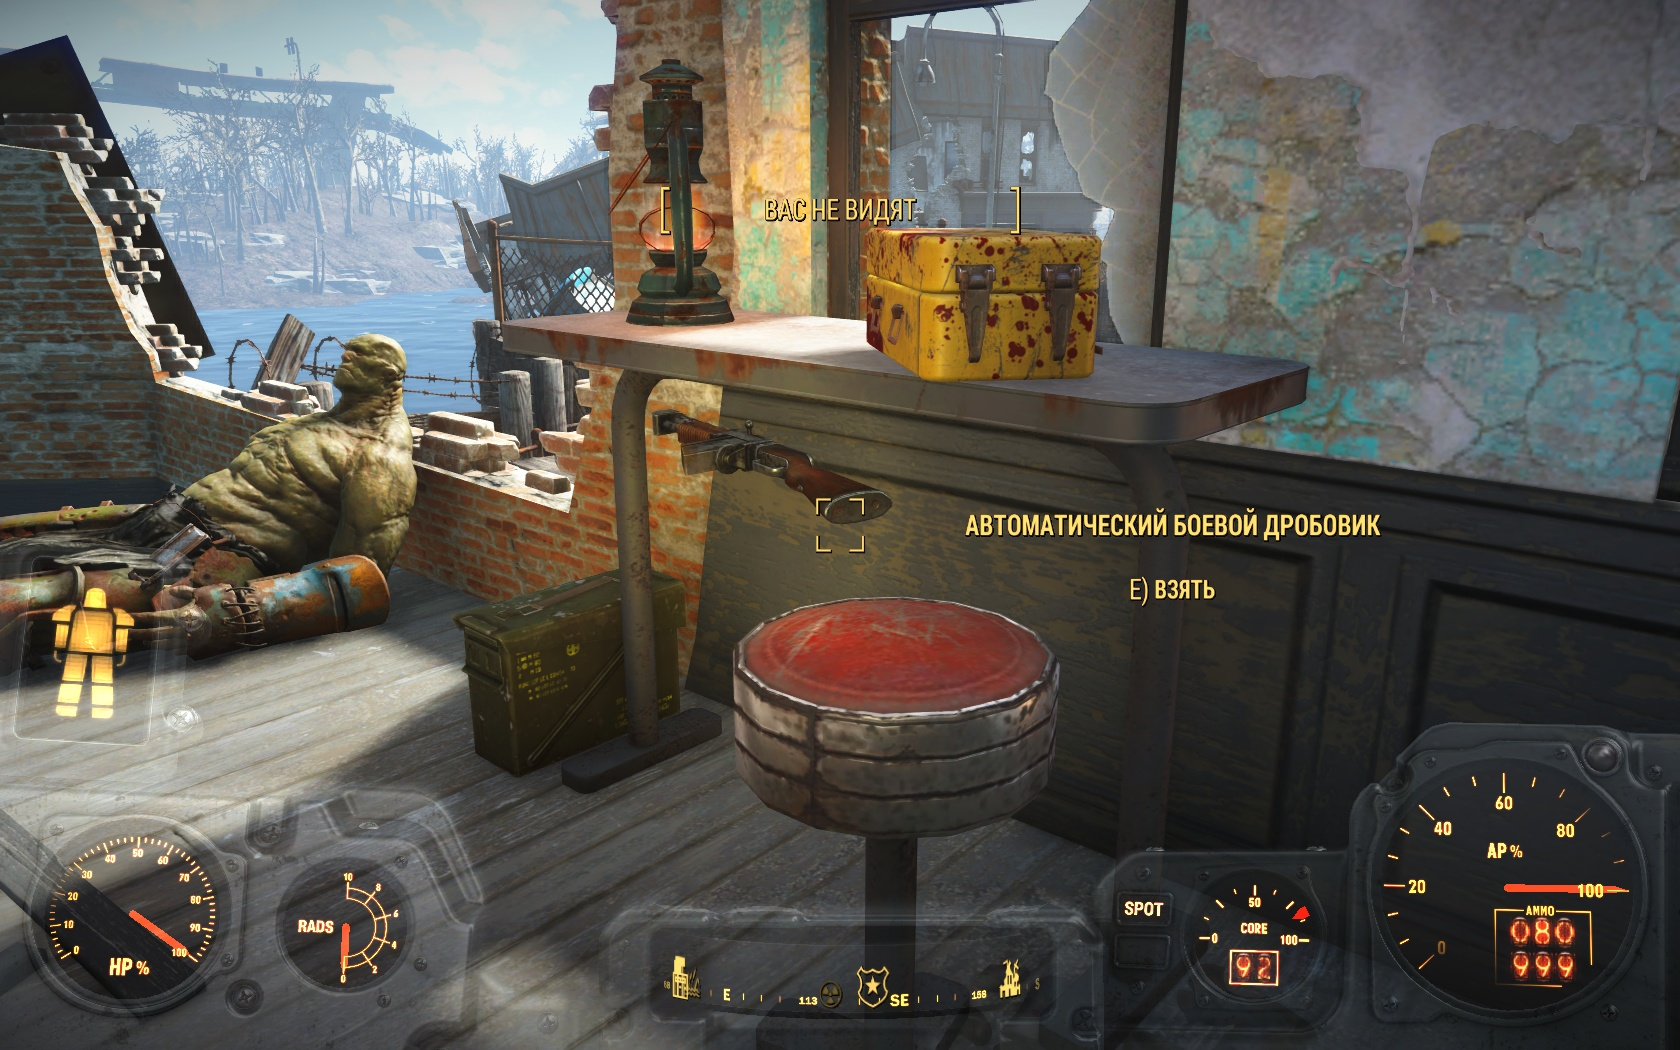 дробовик - Fallout 4 Автоматический, Баг, боевой, Натик-Бэнкс, Оружие